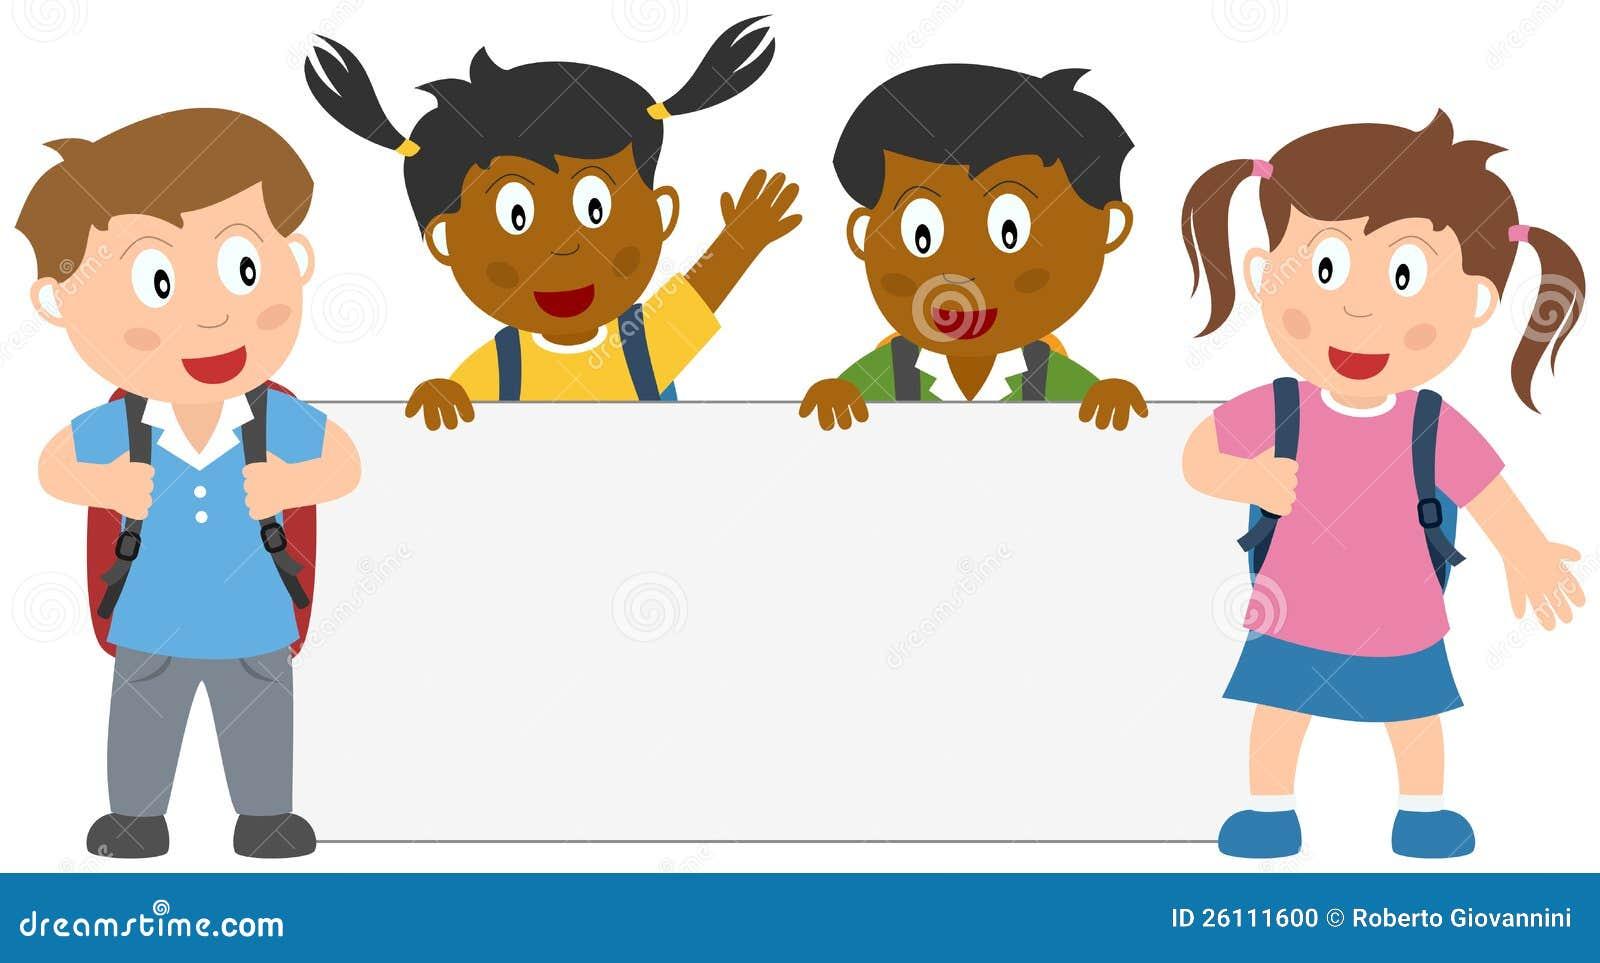 Writing Clipart For Teachers Writing Clipart School